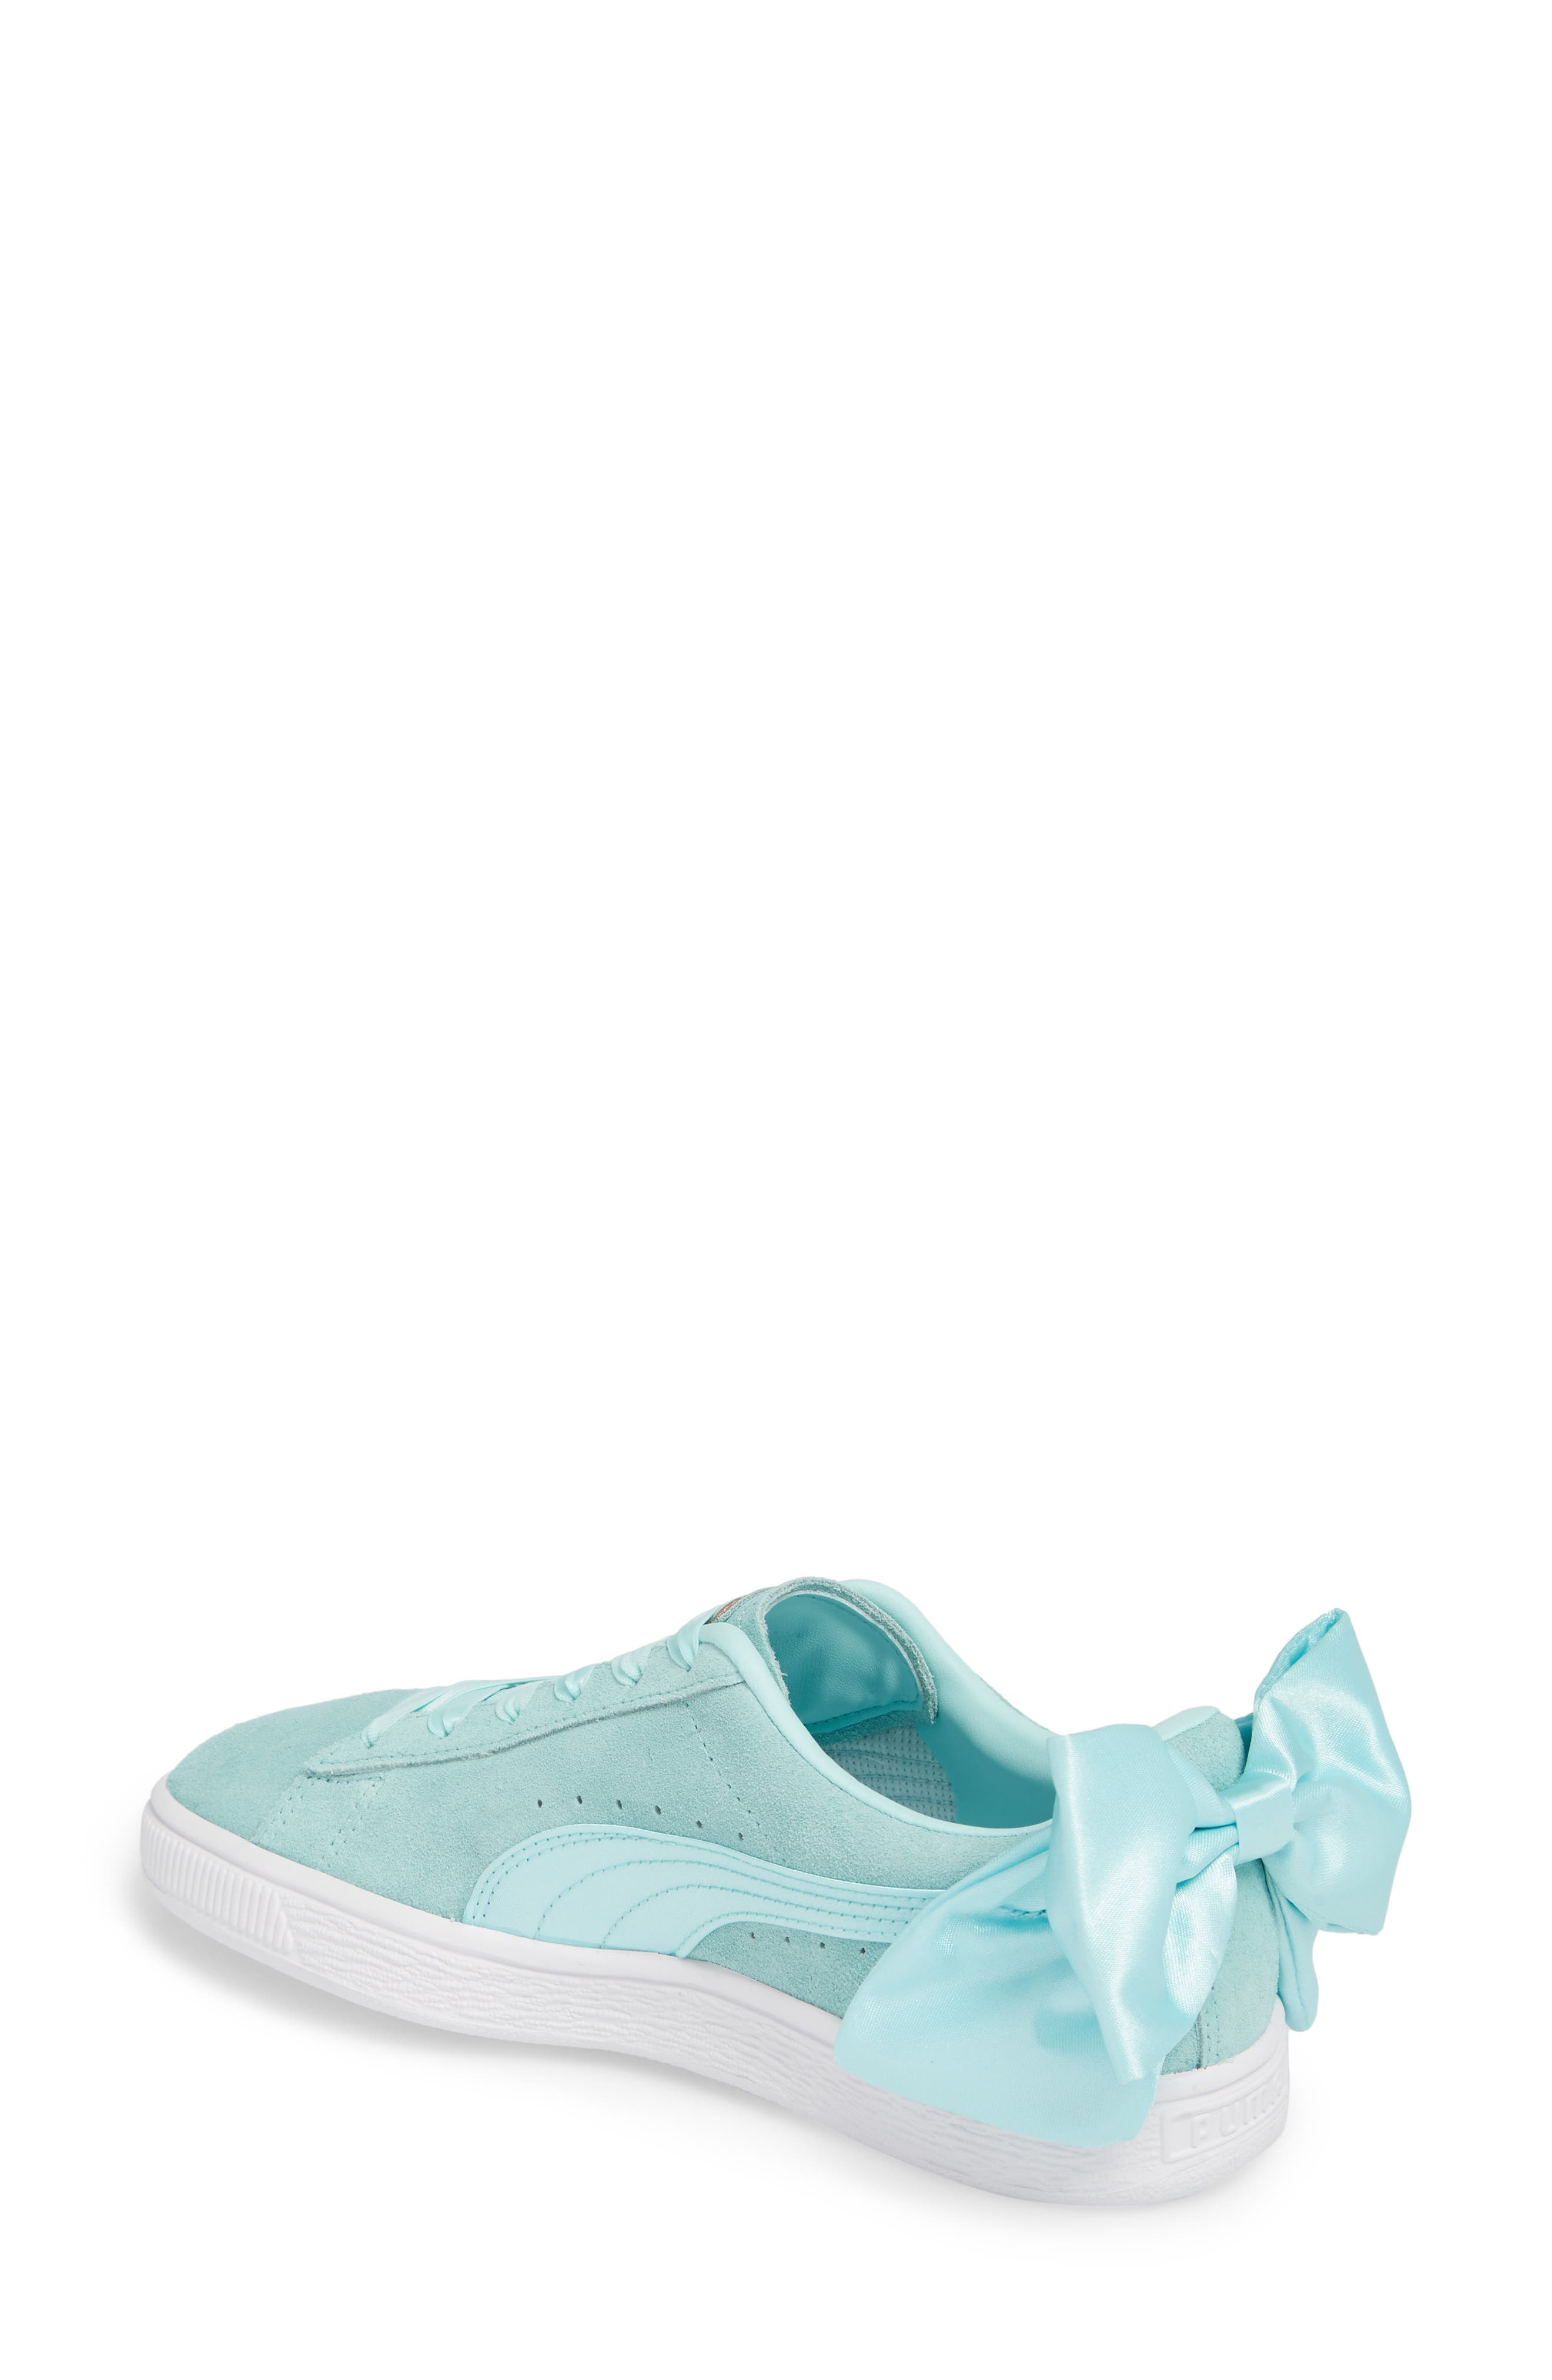 Bow Sneaker,                             Alternate thumbnail 5, color,